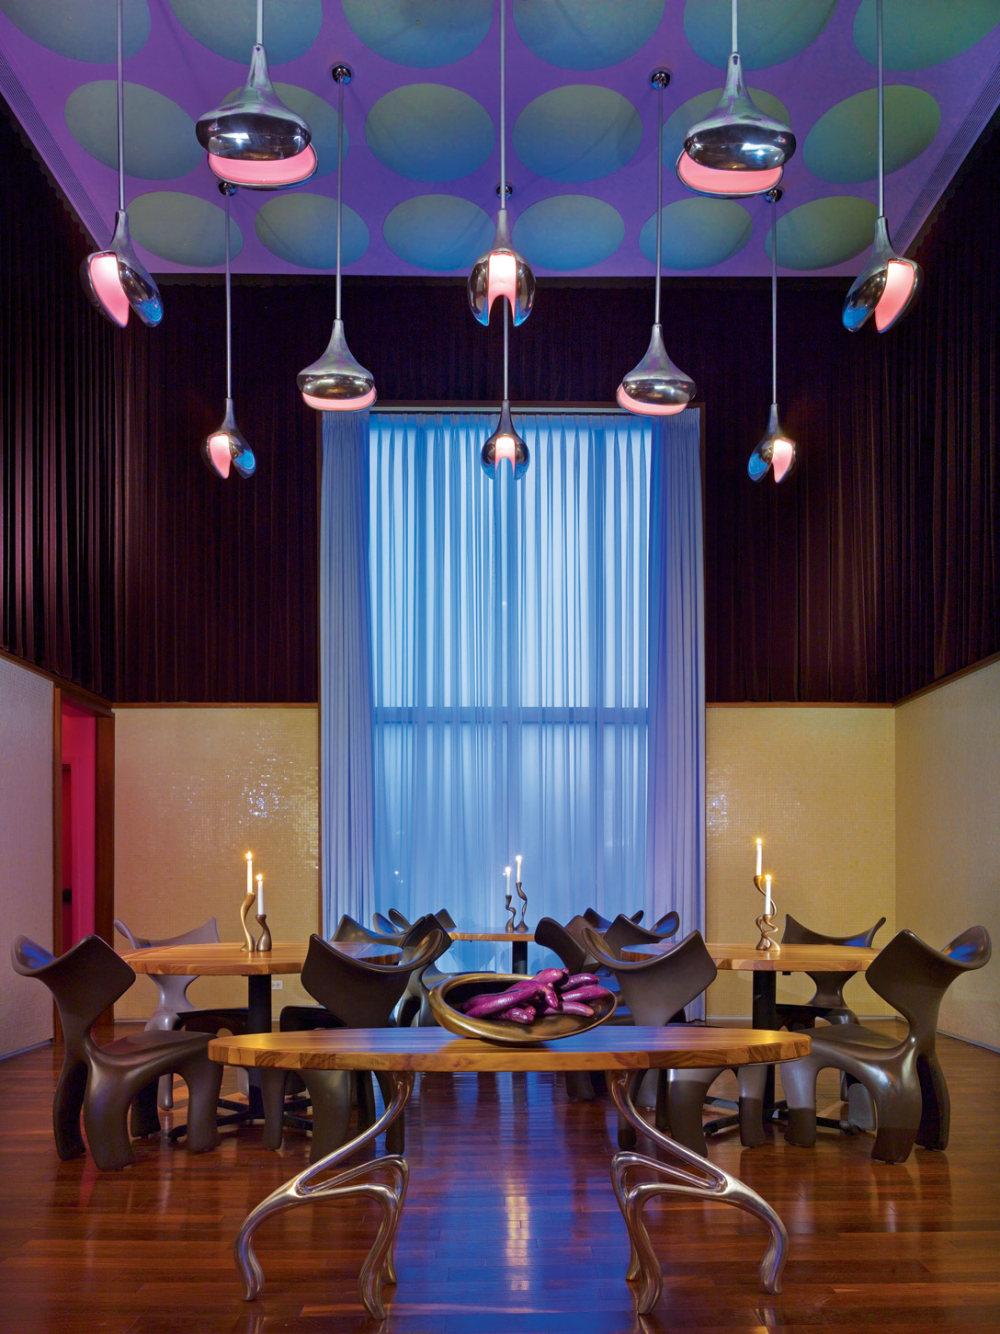 Top restaurant design 高级餐饮空间案例_4920.jpg